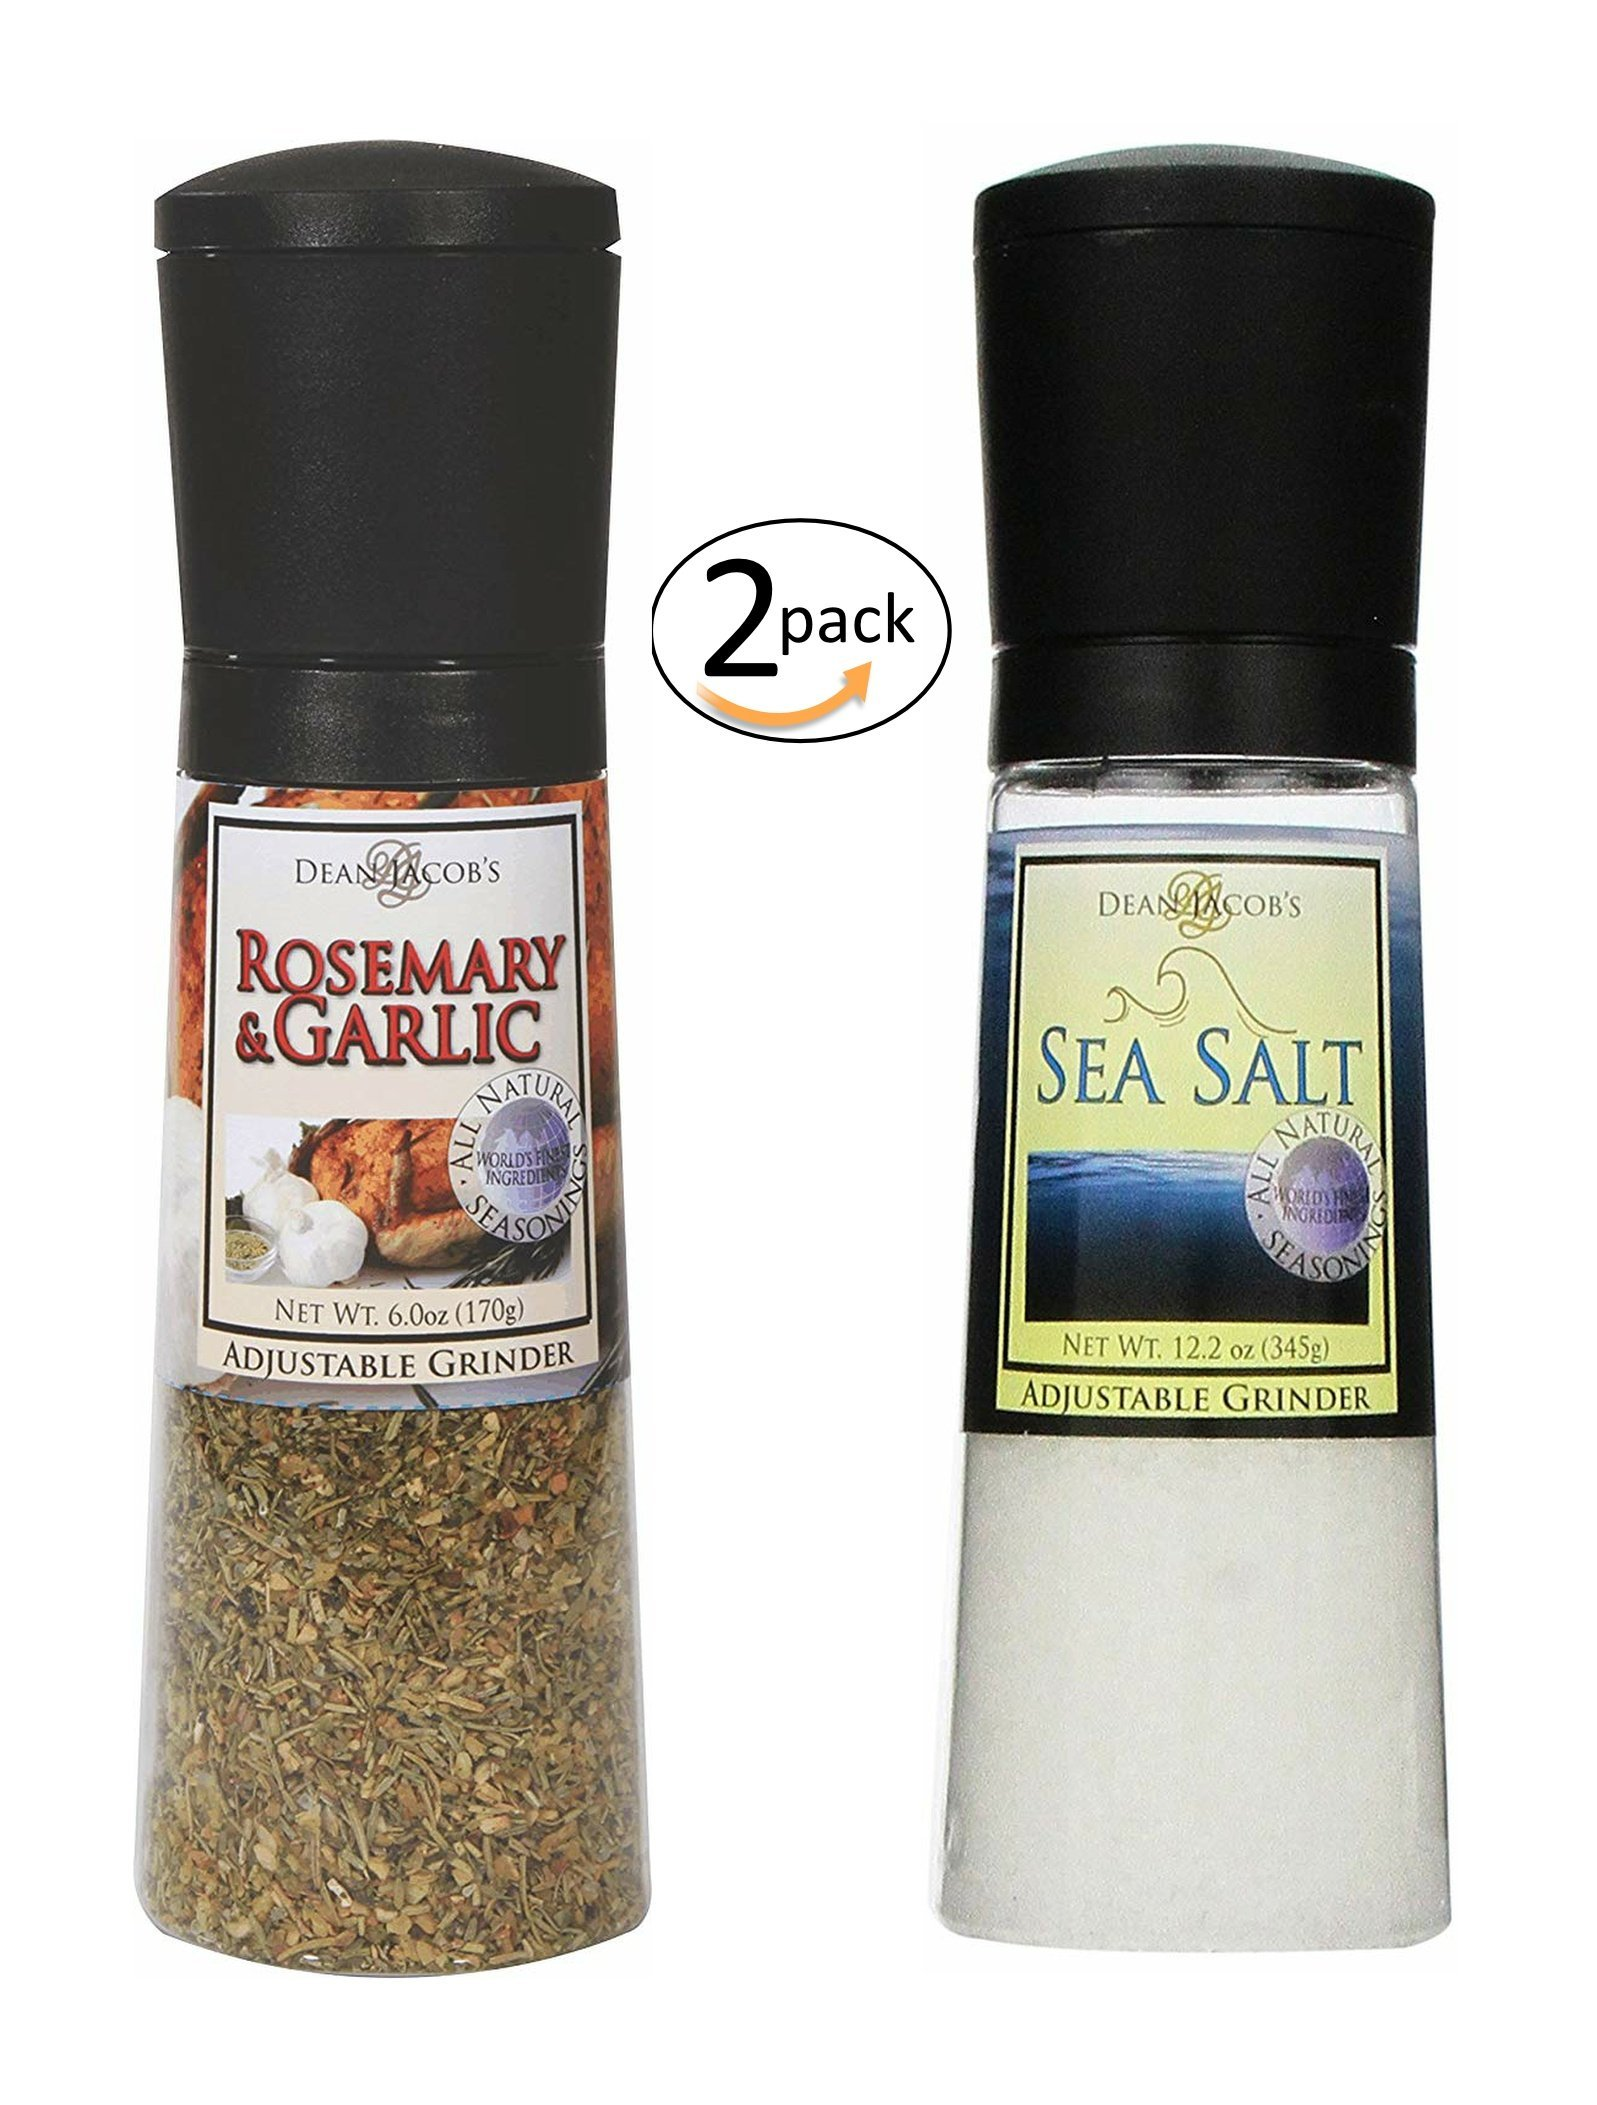 Dean Jacob's Adjustable Grinder Set - Rosemary & Garlic Seasoning 6 oz and Sea Salt 12.2 oz - 2 pack